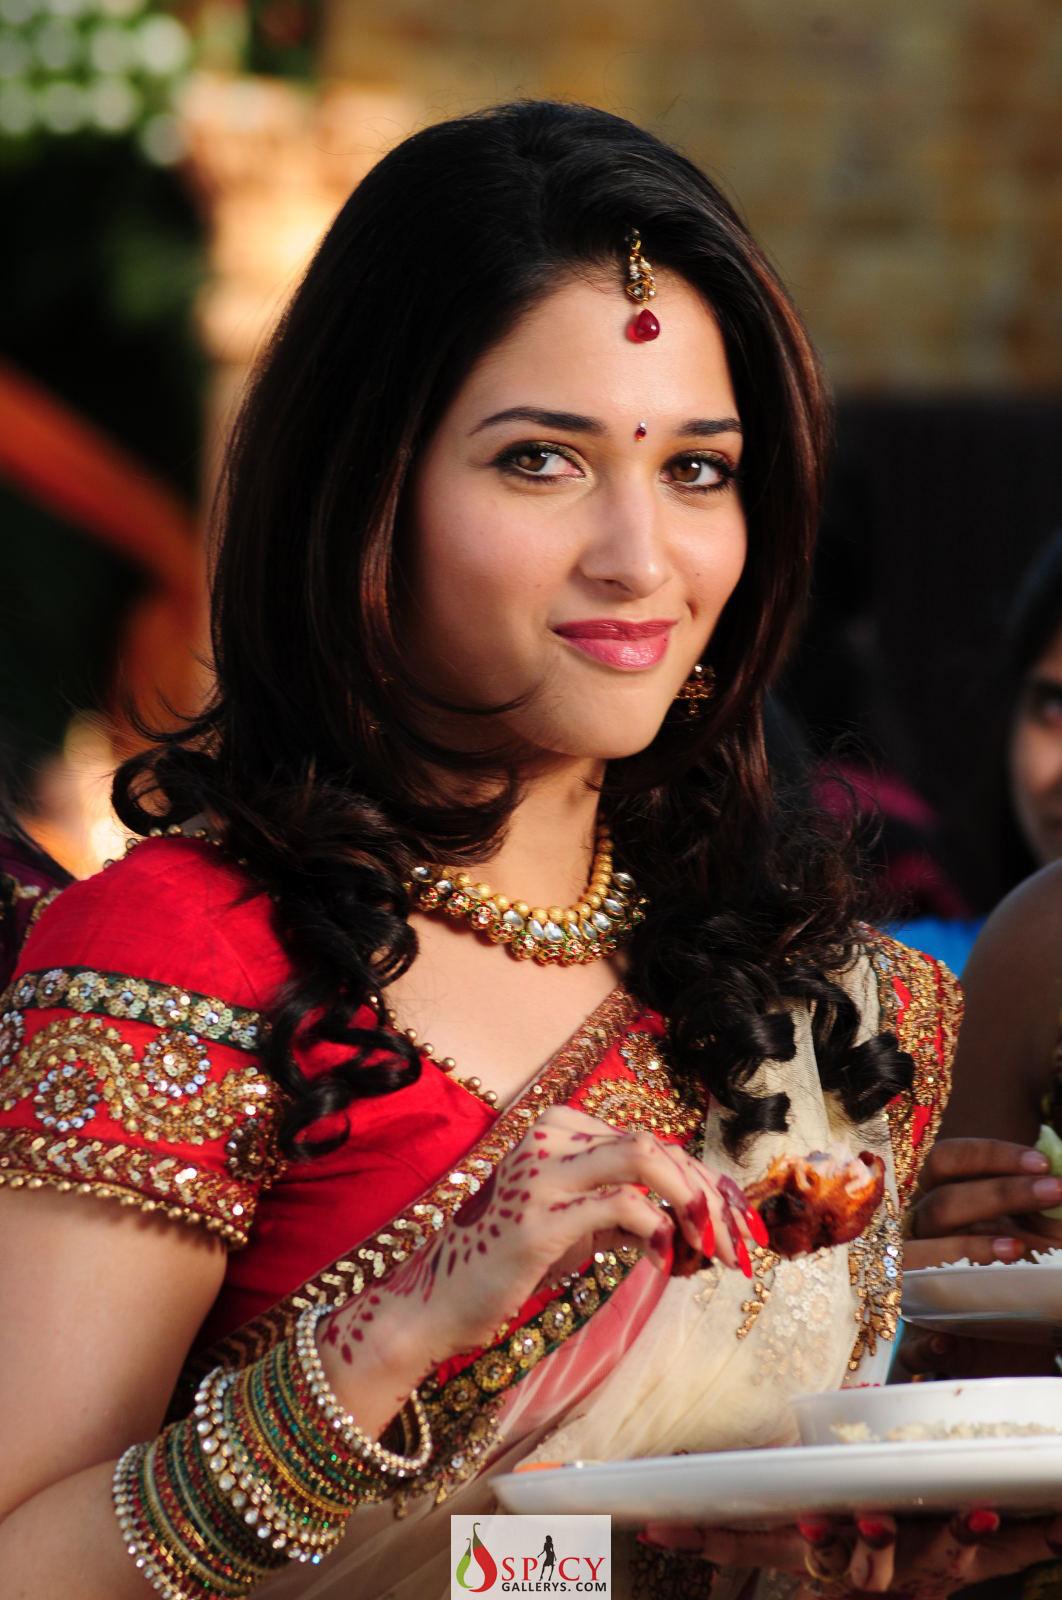 Tamanna New Spicy Photos, In 100% Love Percent Movie